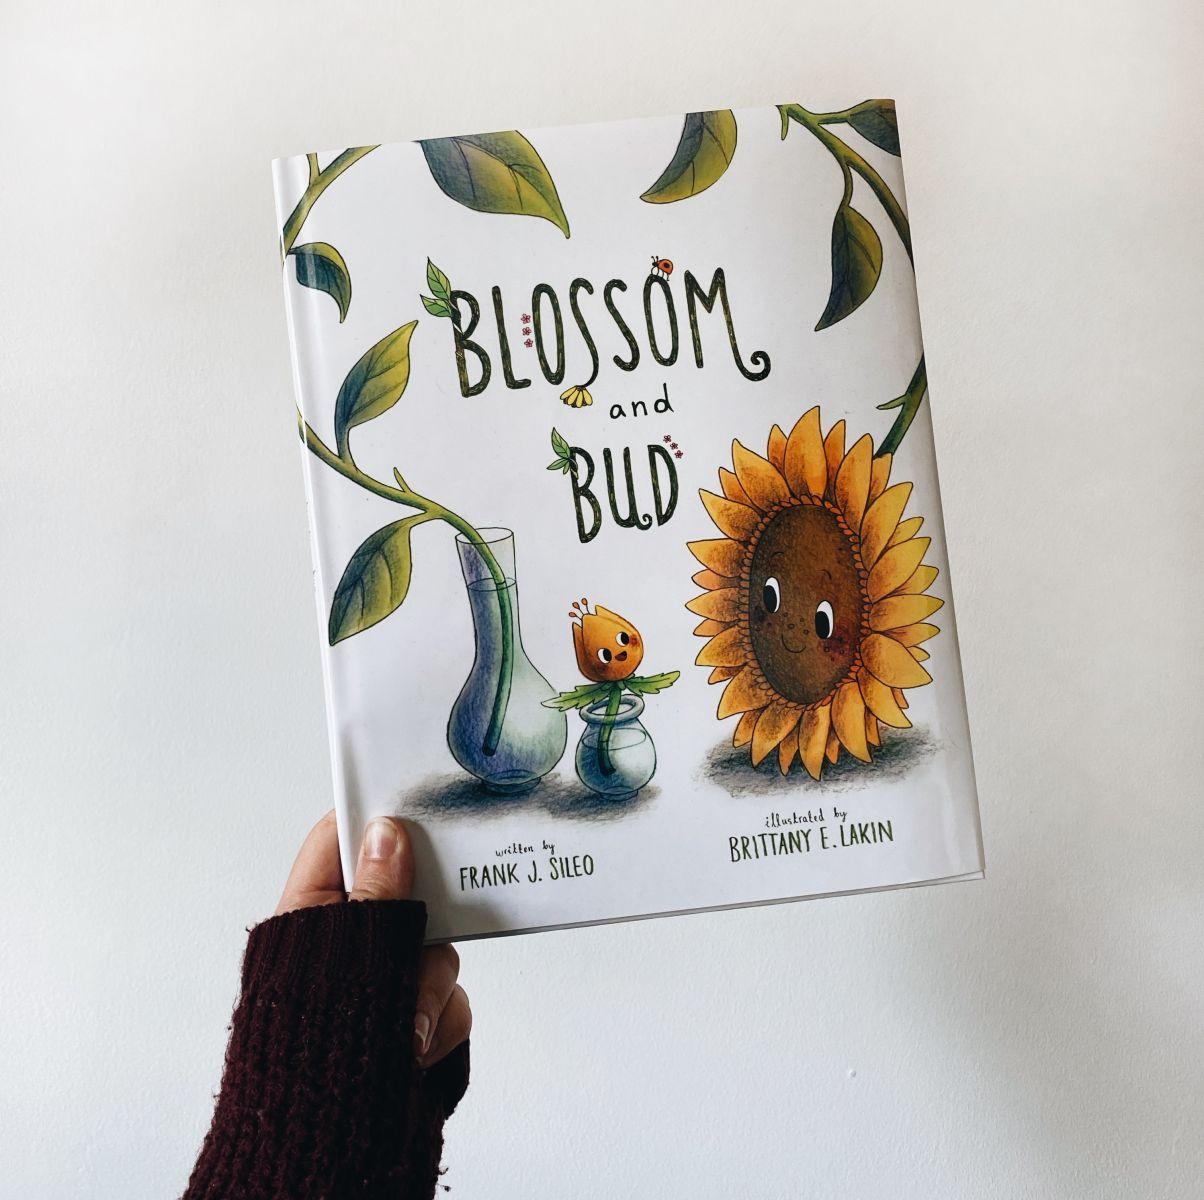 blossom-and-bud